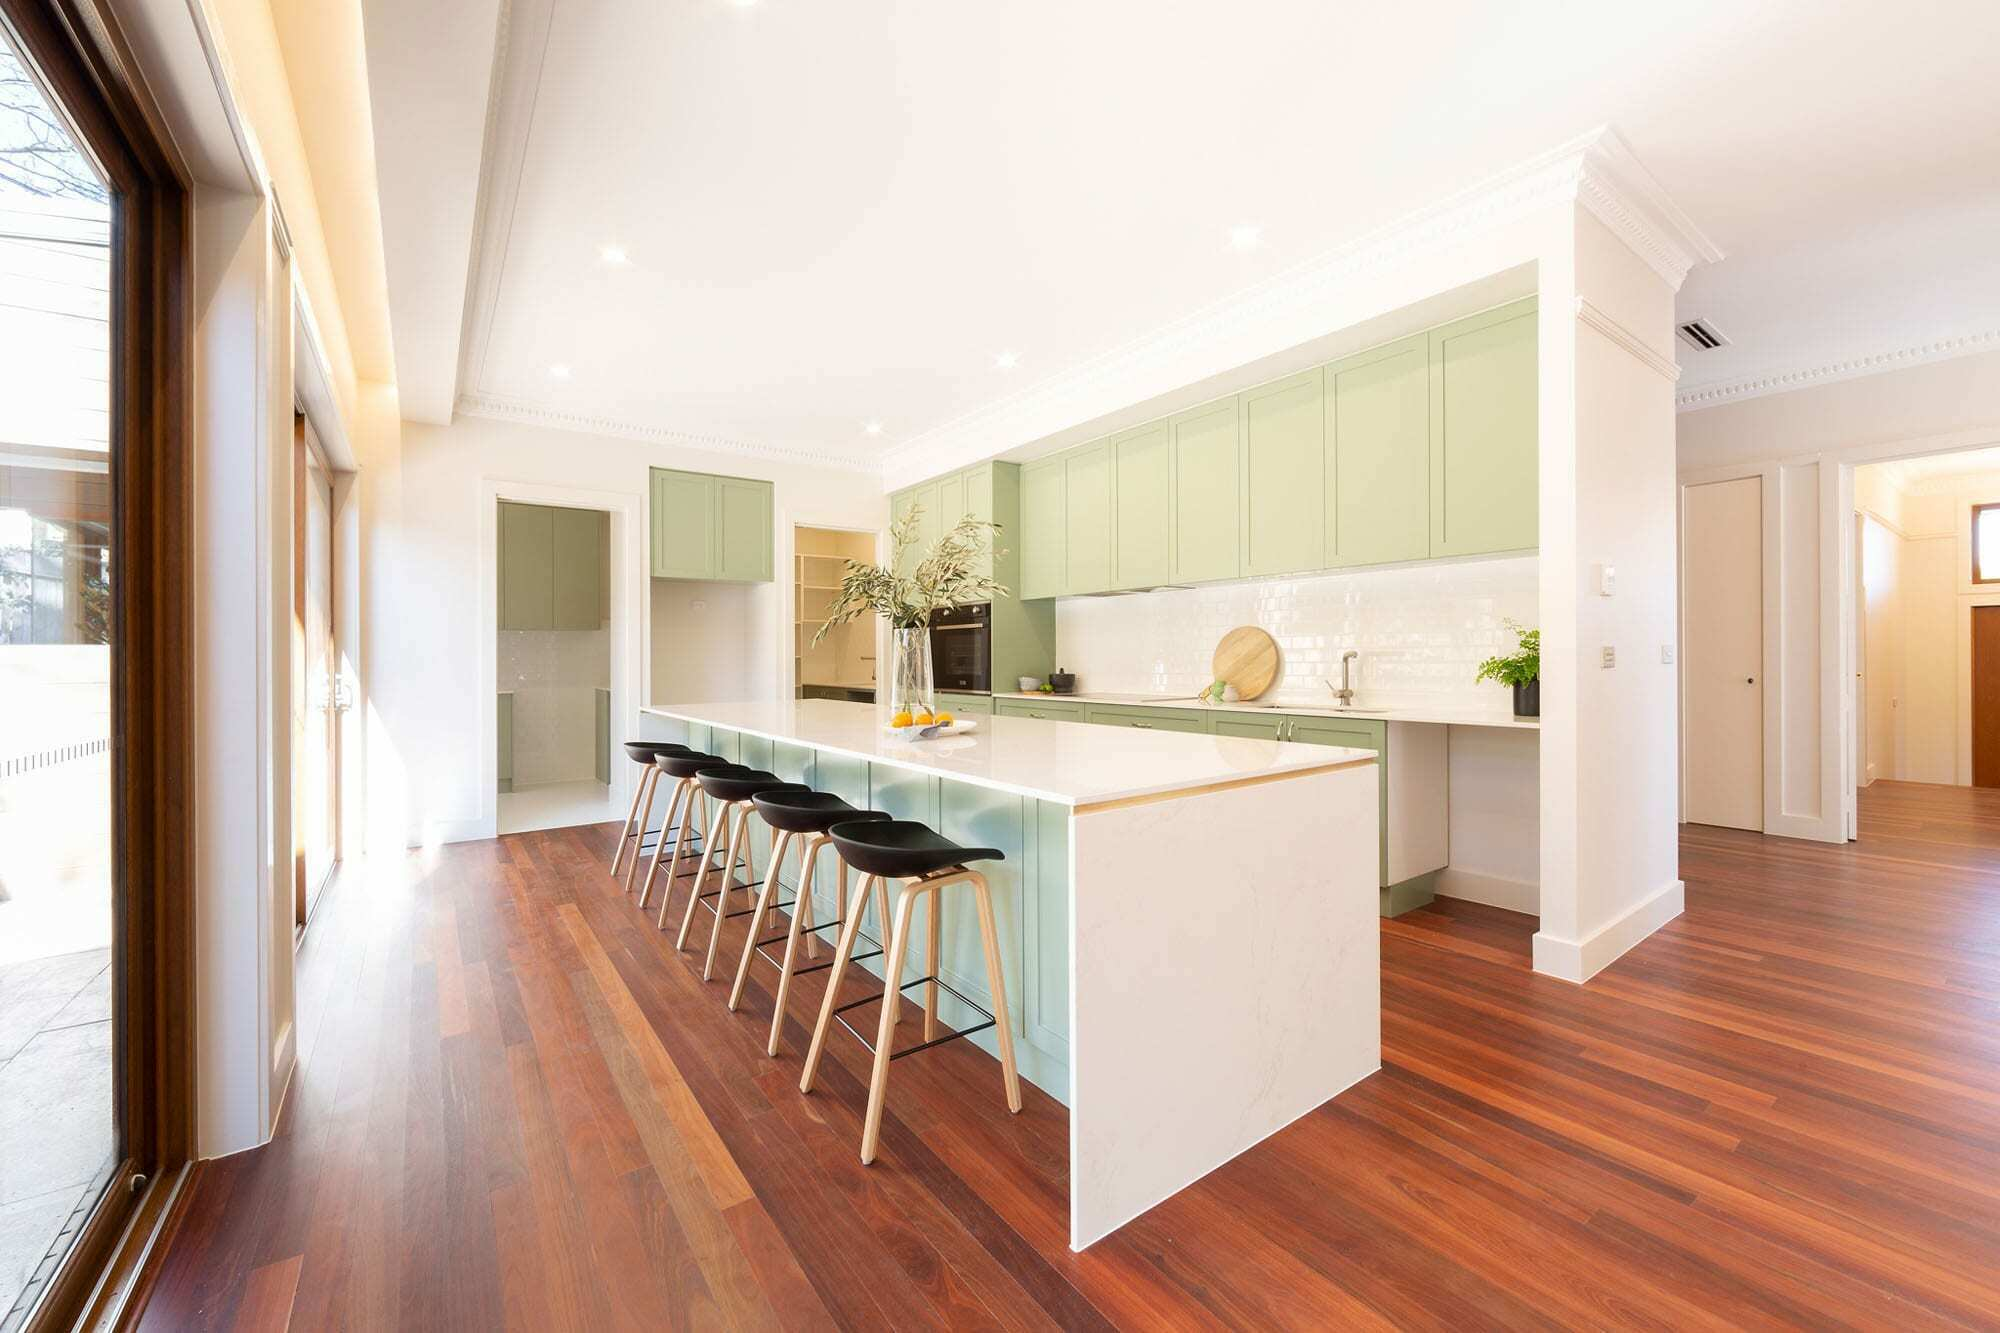 Homes by Howe Canberra builder – Governor Generals' renovation extension – Kitchen